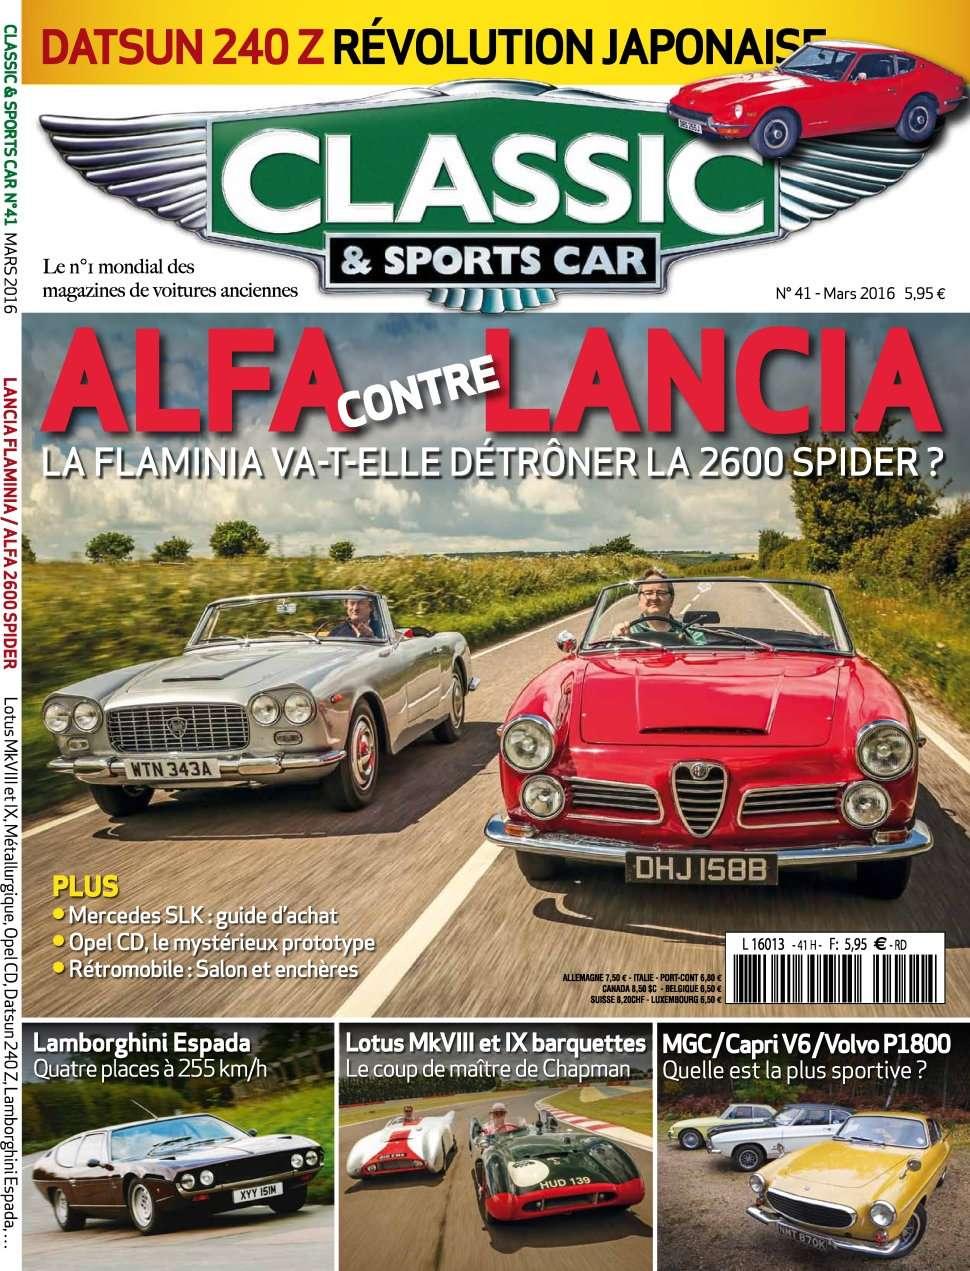 Classic & Sports Car 41 - Mars 2016